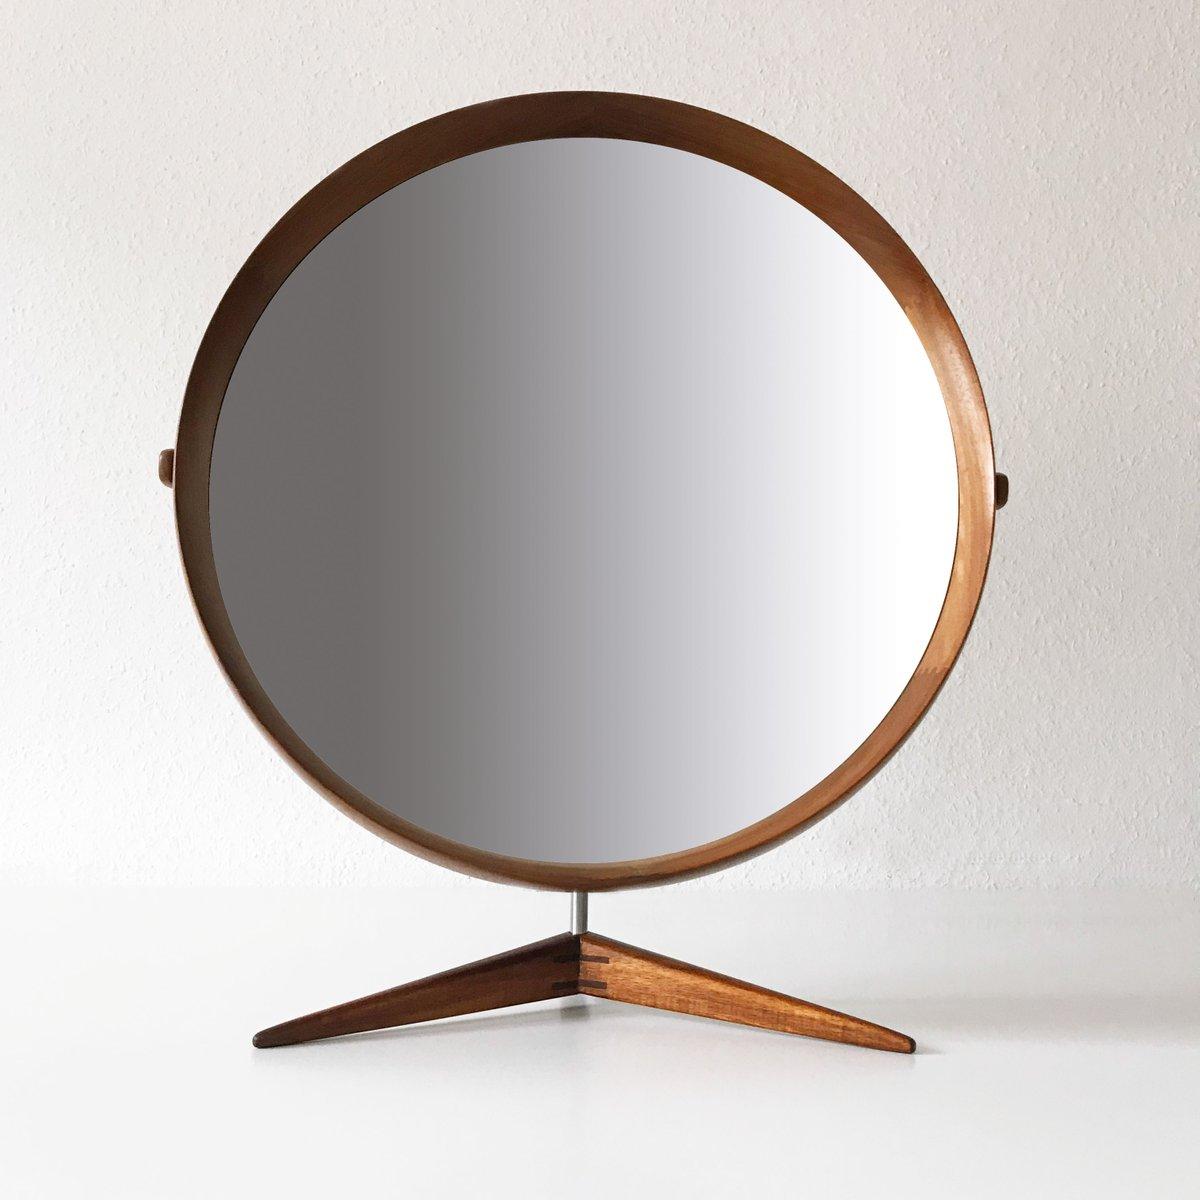 Mid Century Swedish Large Teak Table Mirror By 214 Sten Amp Uno